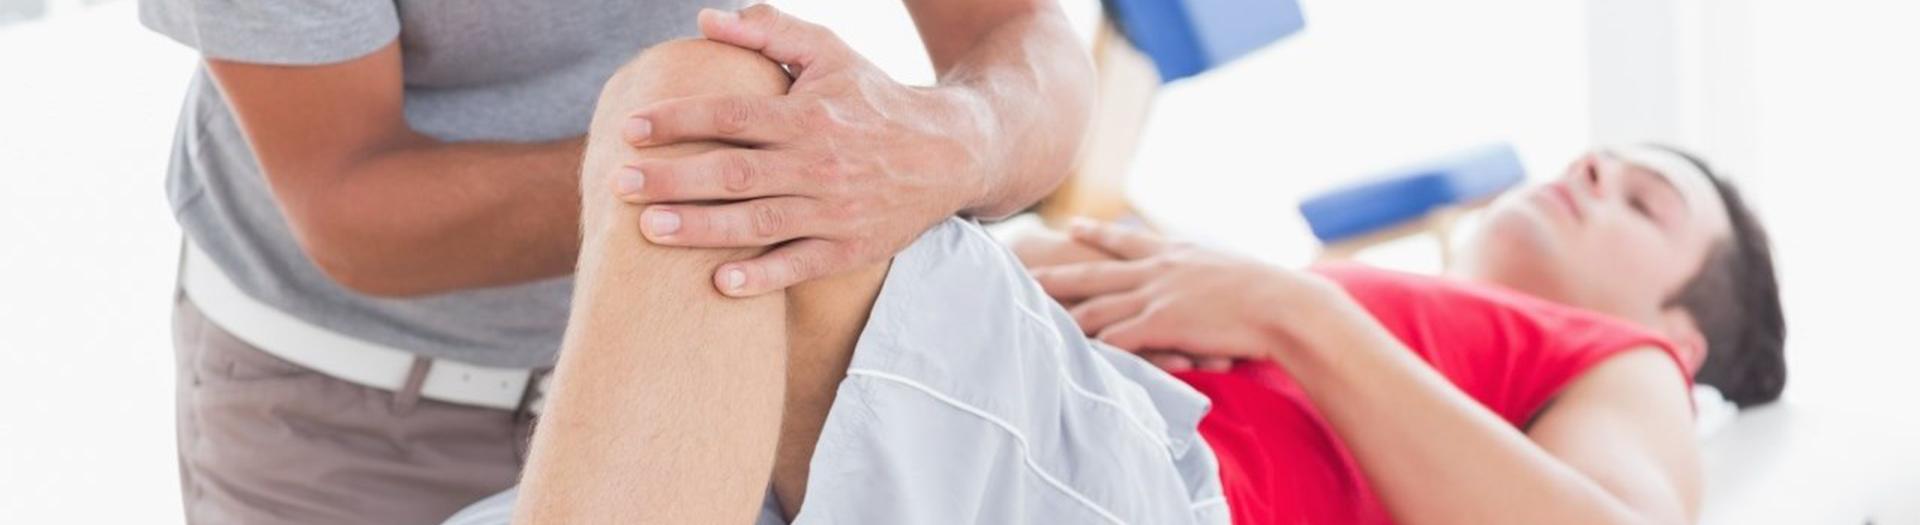 fysiotherapie-fysiotherapiedeburen-1280